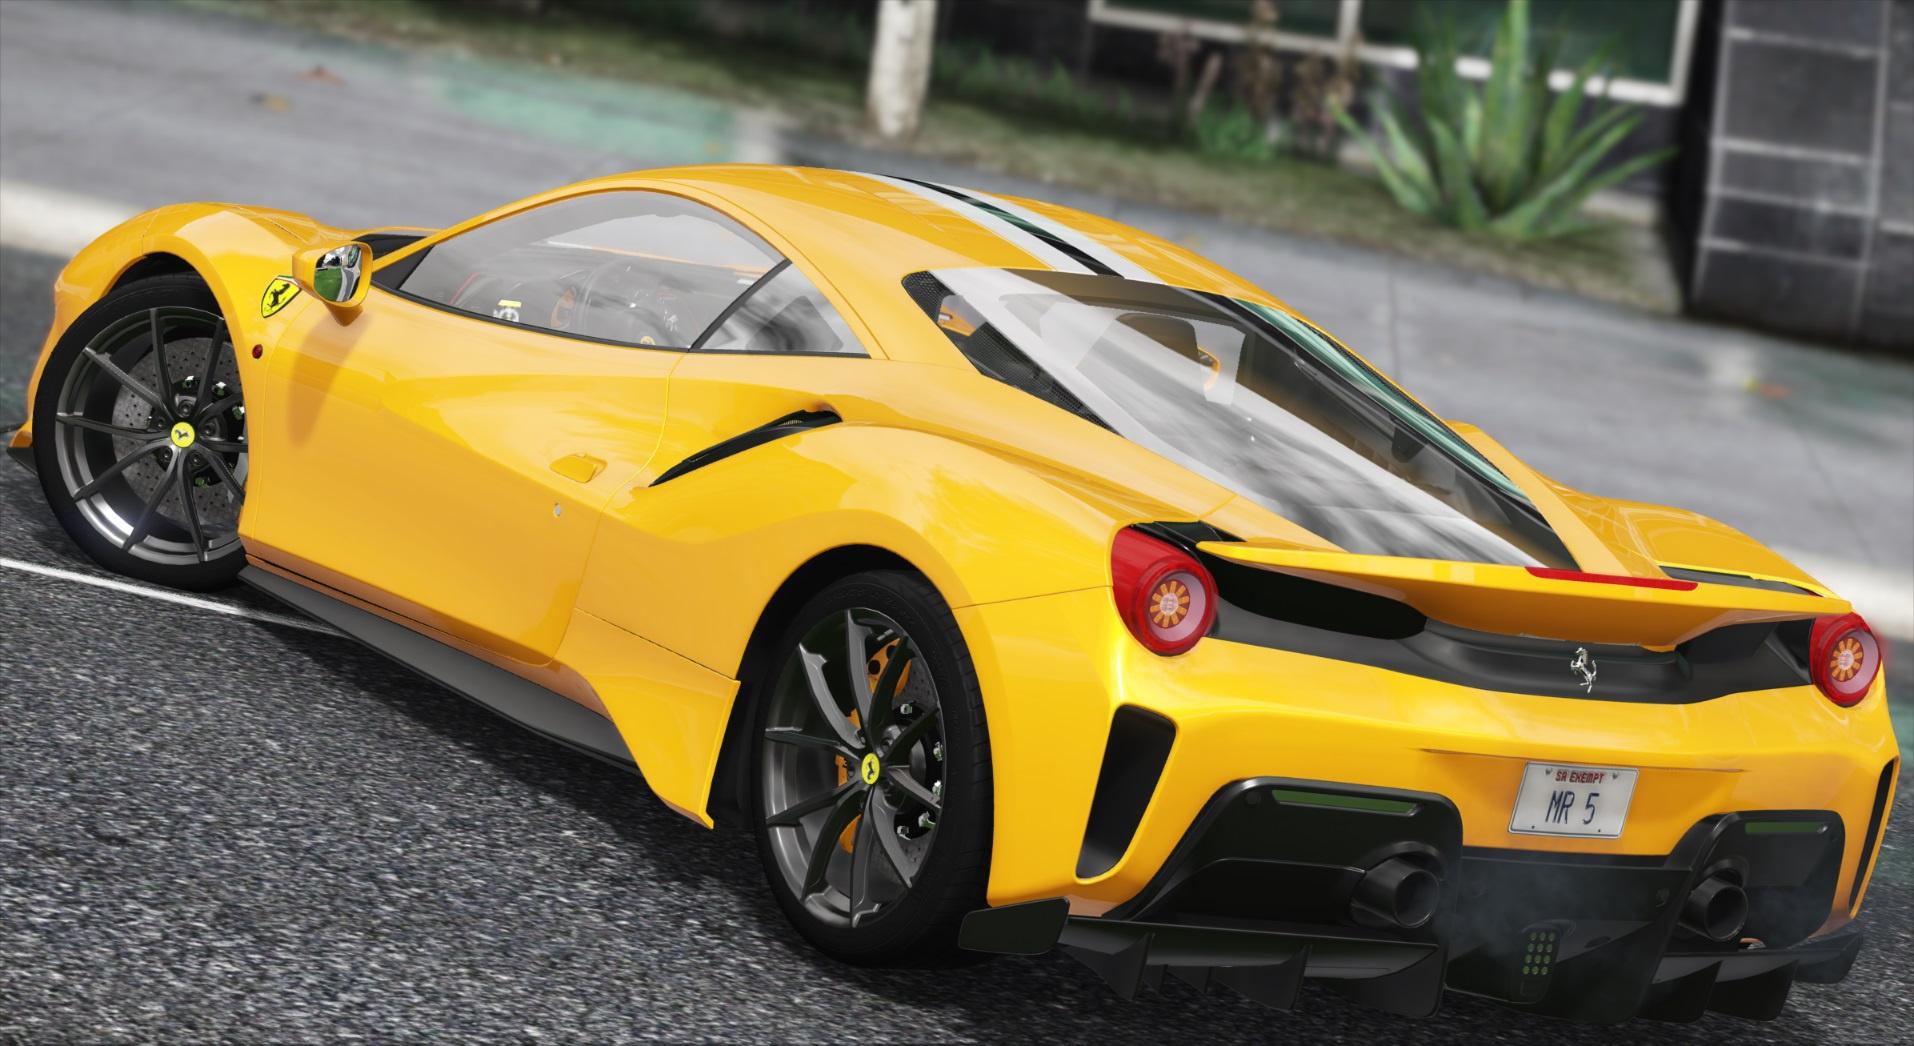 2019 Ferrari 488 Pista [Add-On/Template]